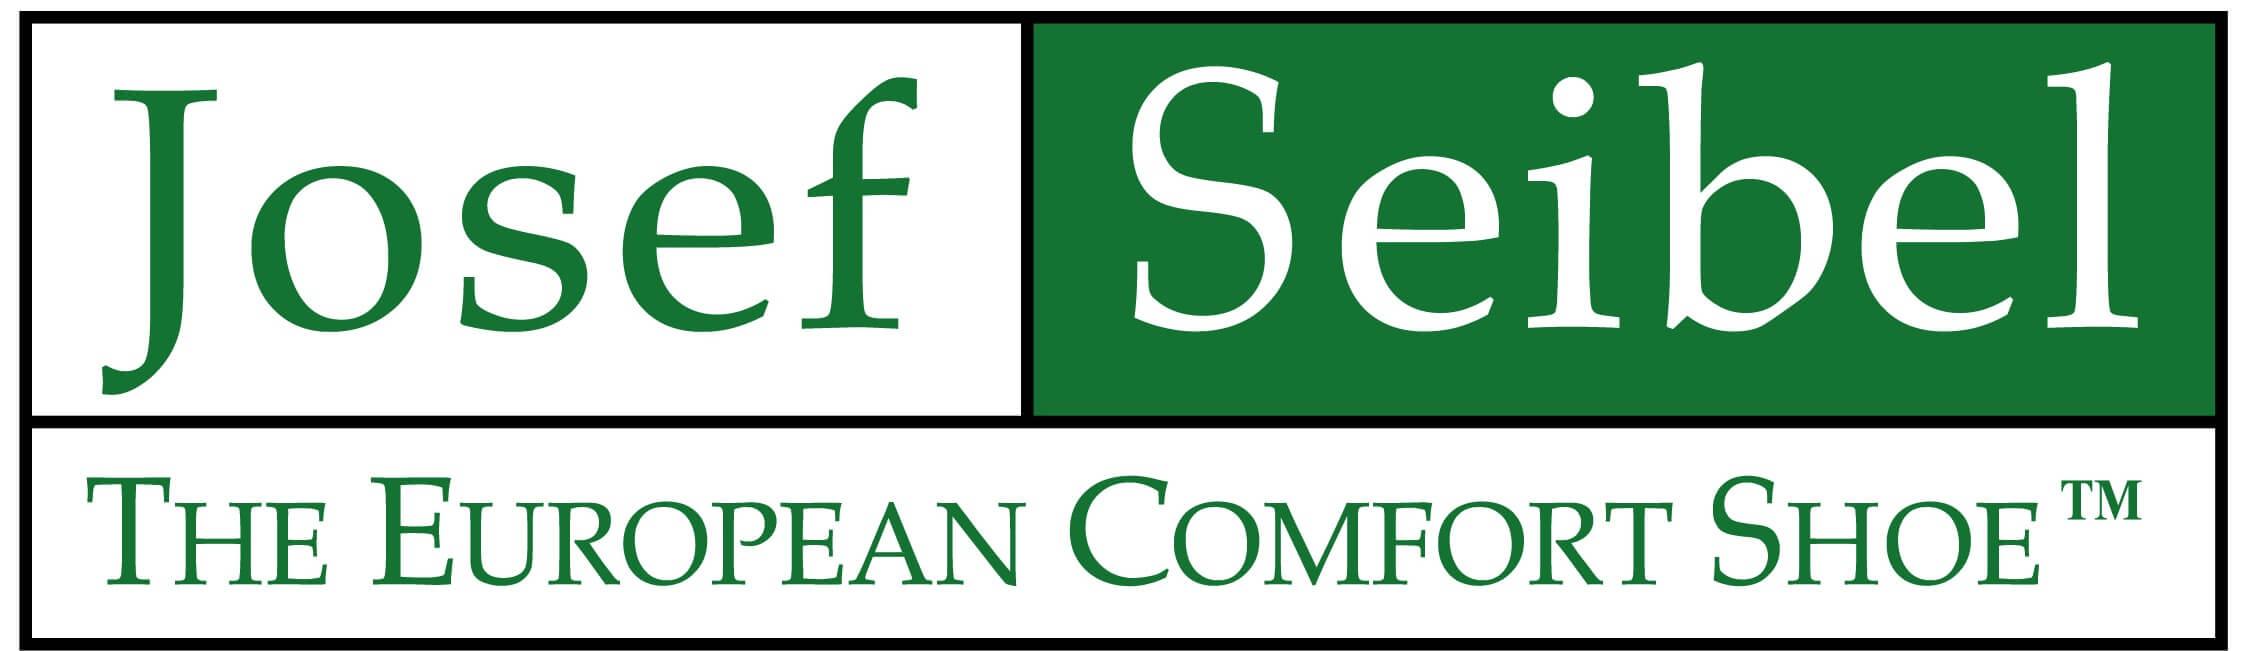 josefseibel-logo